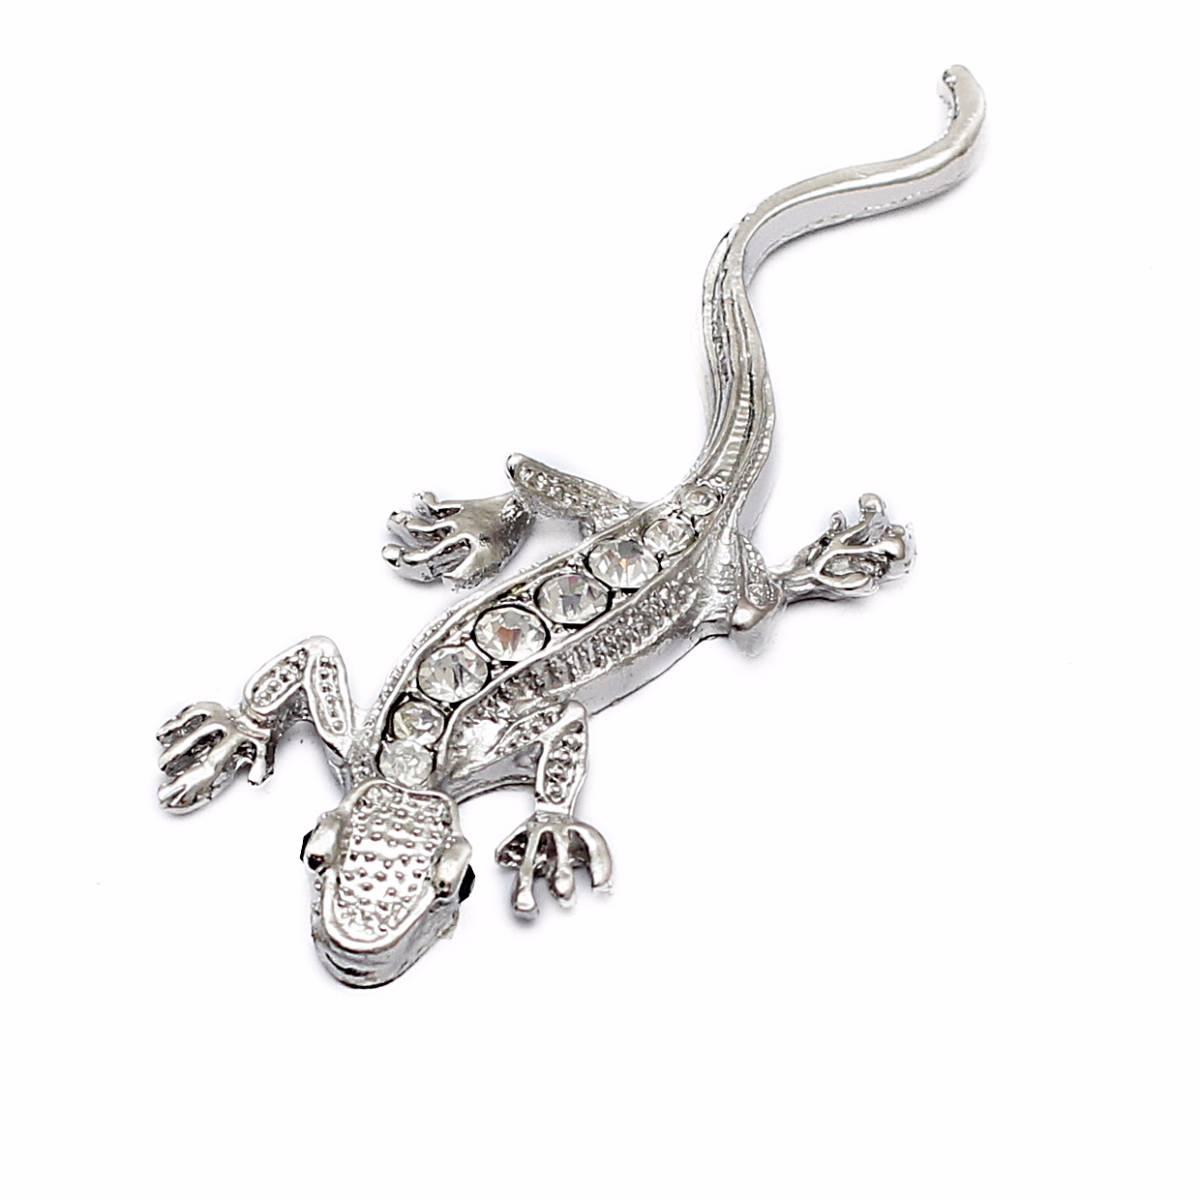 Emblem Variasi Gecko - Chrome